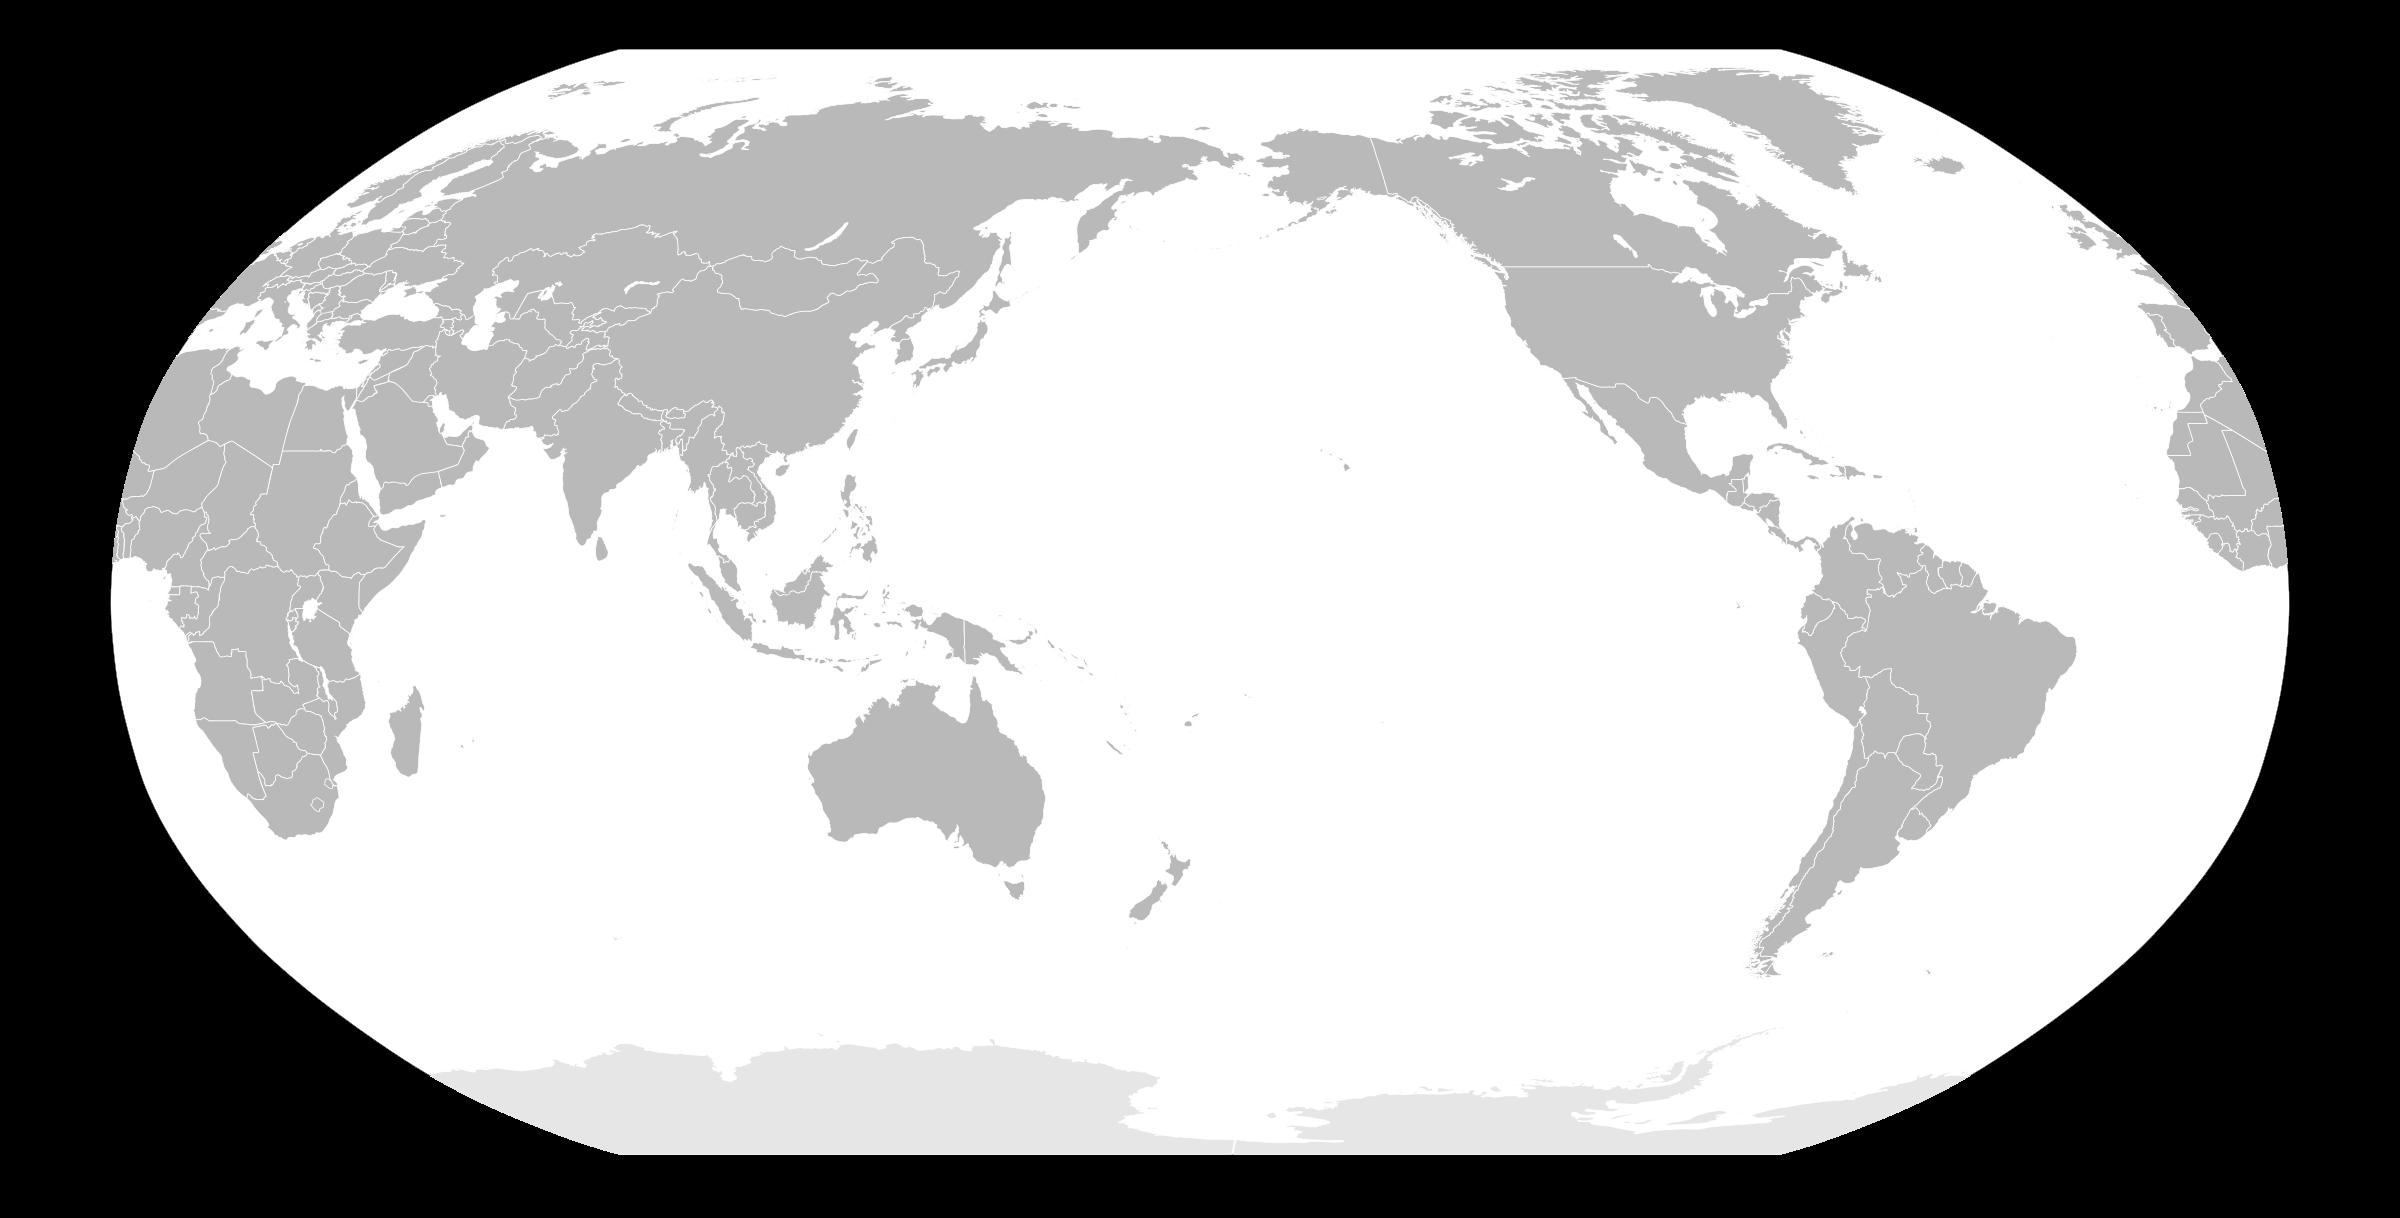 World map clipart uship svg stock Clipart - World Map - Japan POV svg stock